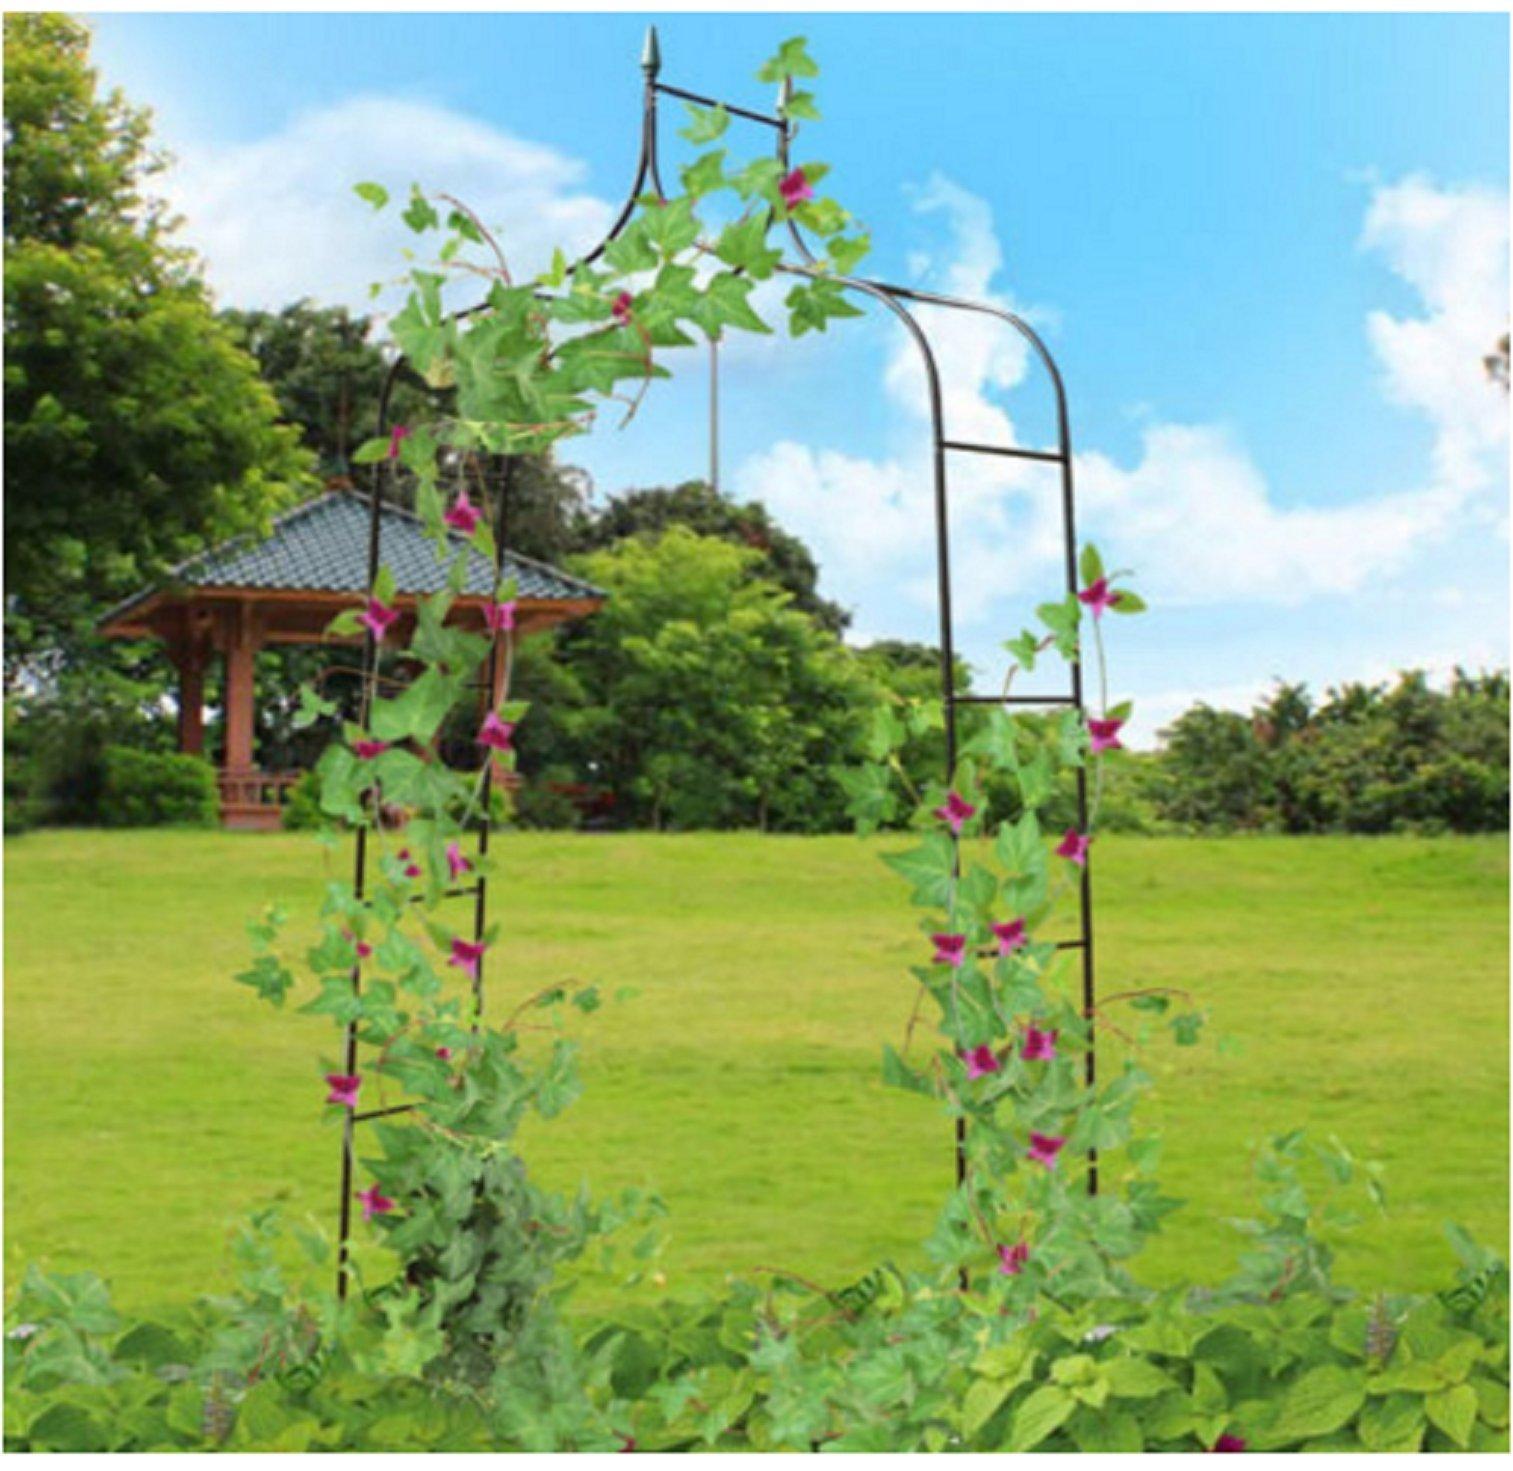 USA Premium Store 8'4 High x 4'7 Wide Steel Garden Arch Rose Arbor Climbing Plant Outdoor Garden